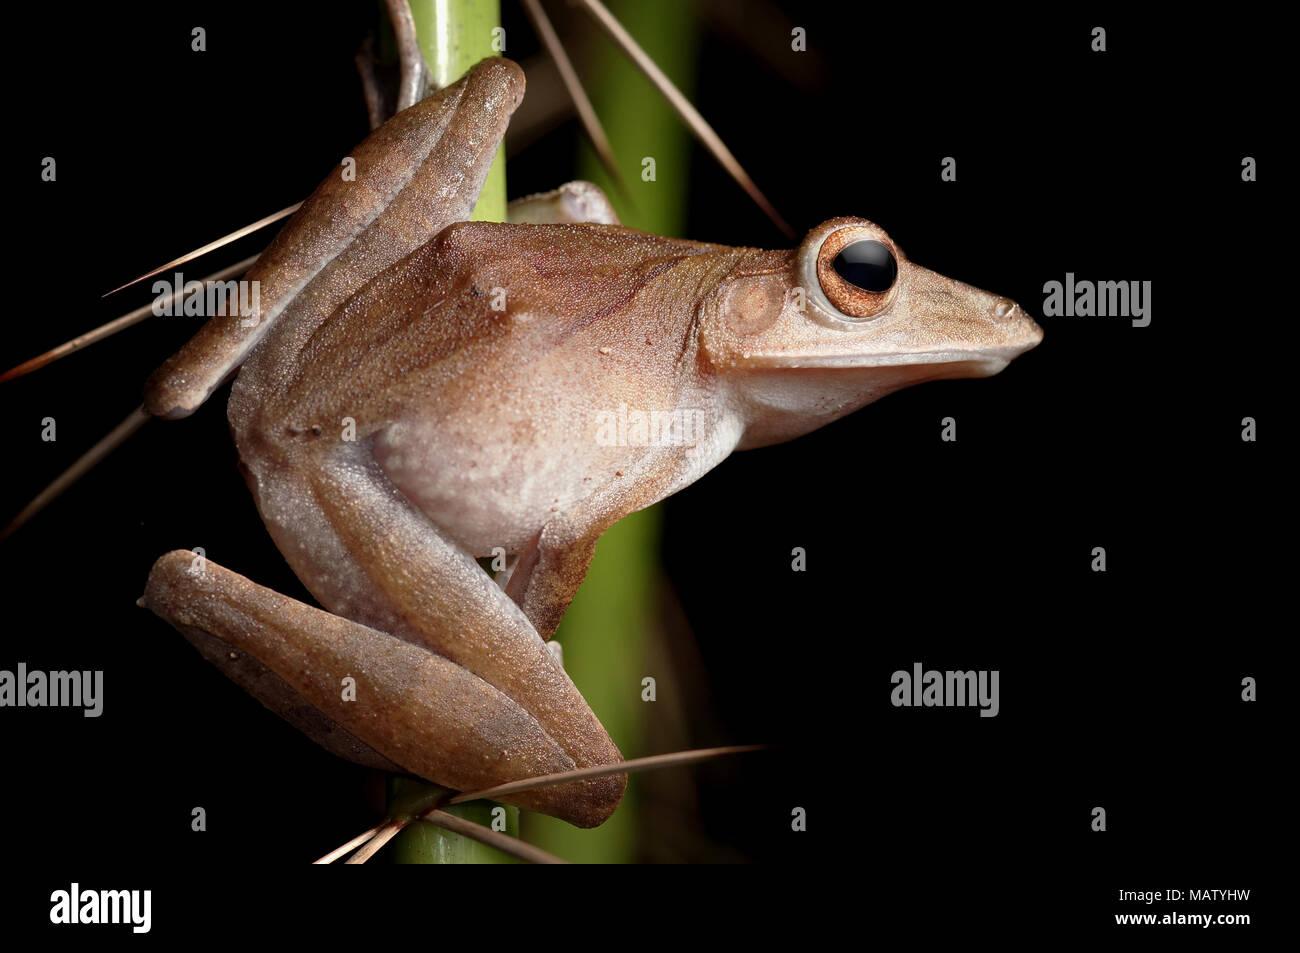 Collett's tree frog Polypedates colletti - Stock Image